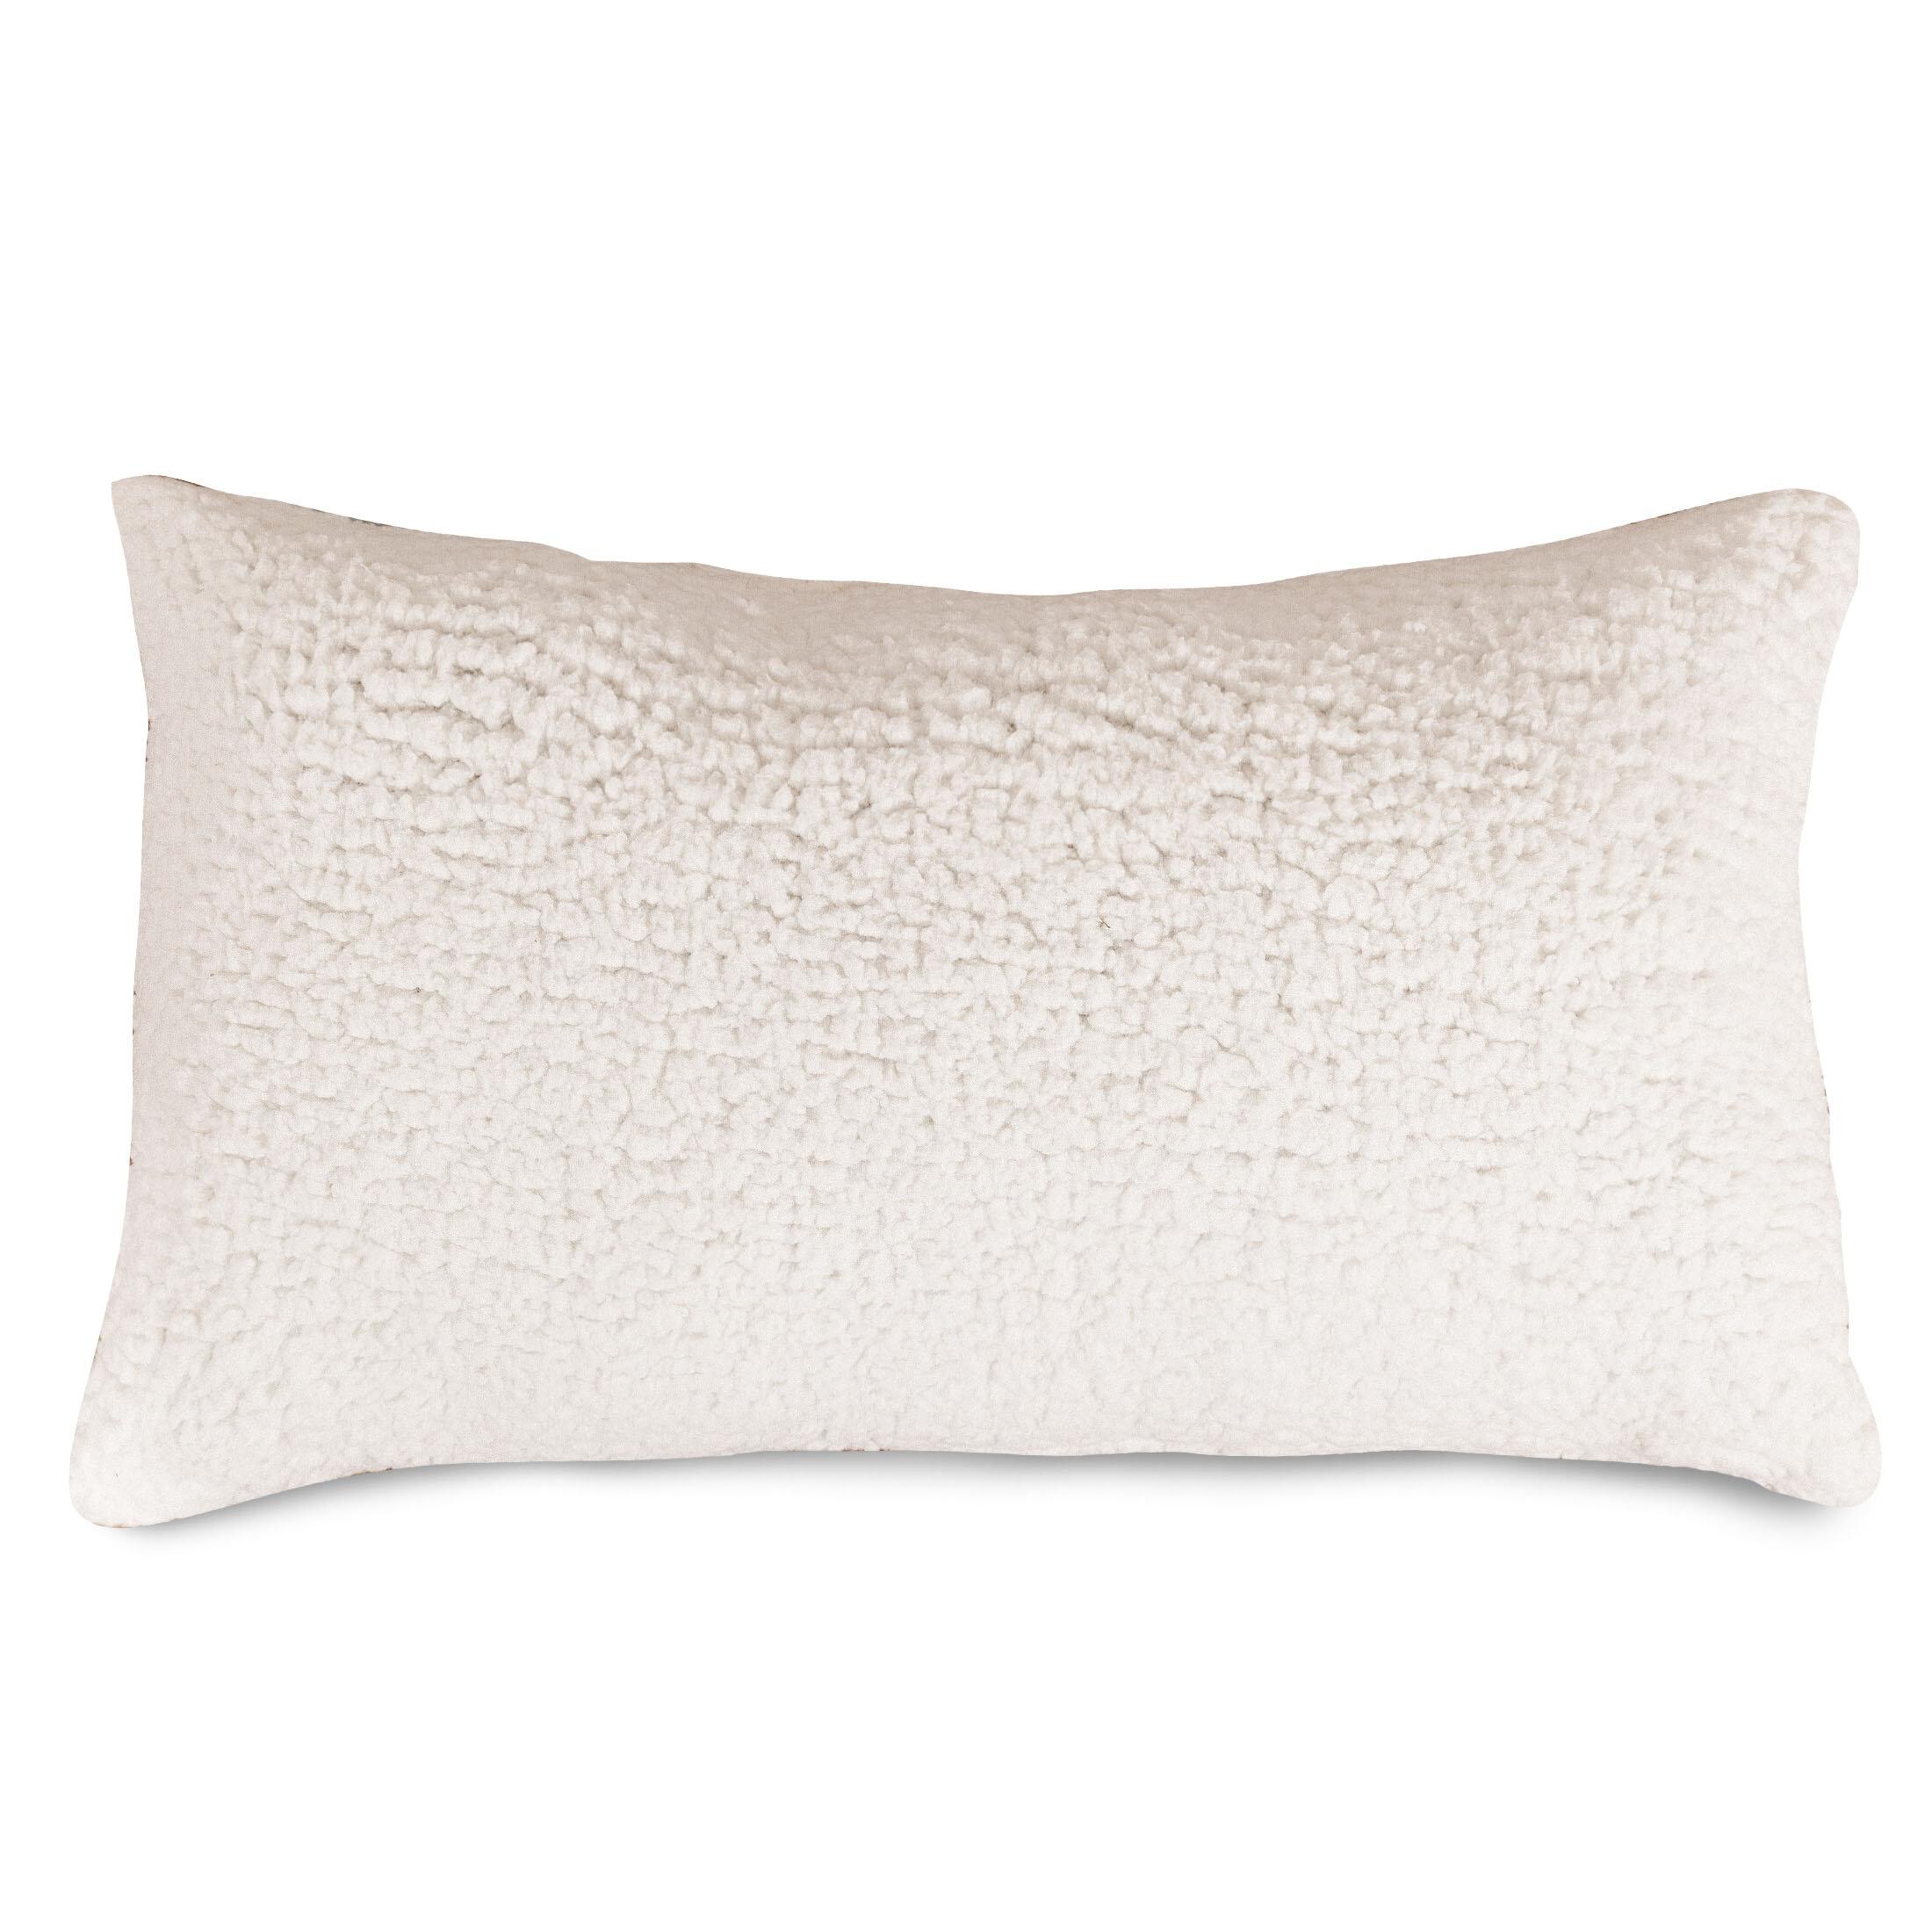 White Noise Sherpa Rectangular Faux Leather Throw Pillow Reviews Wayfair